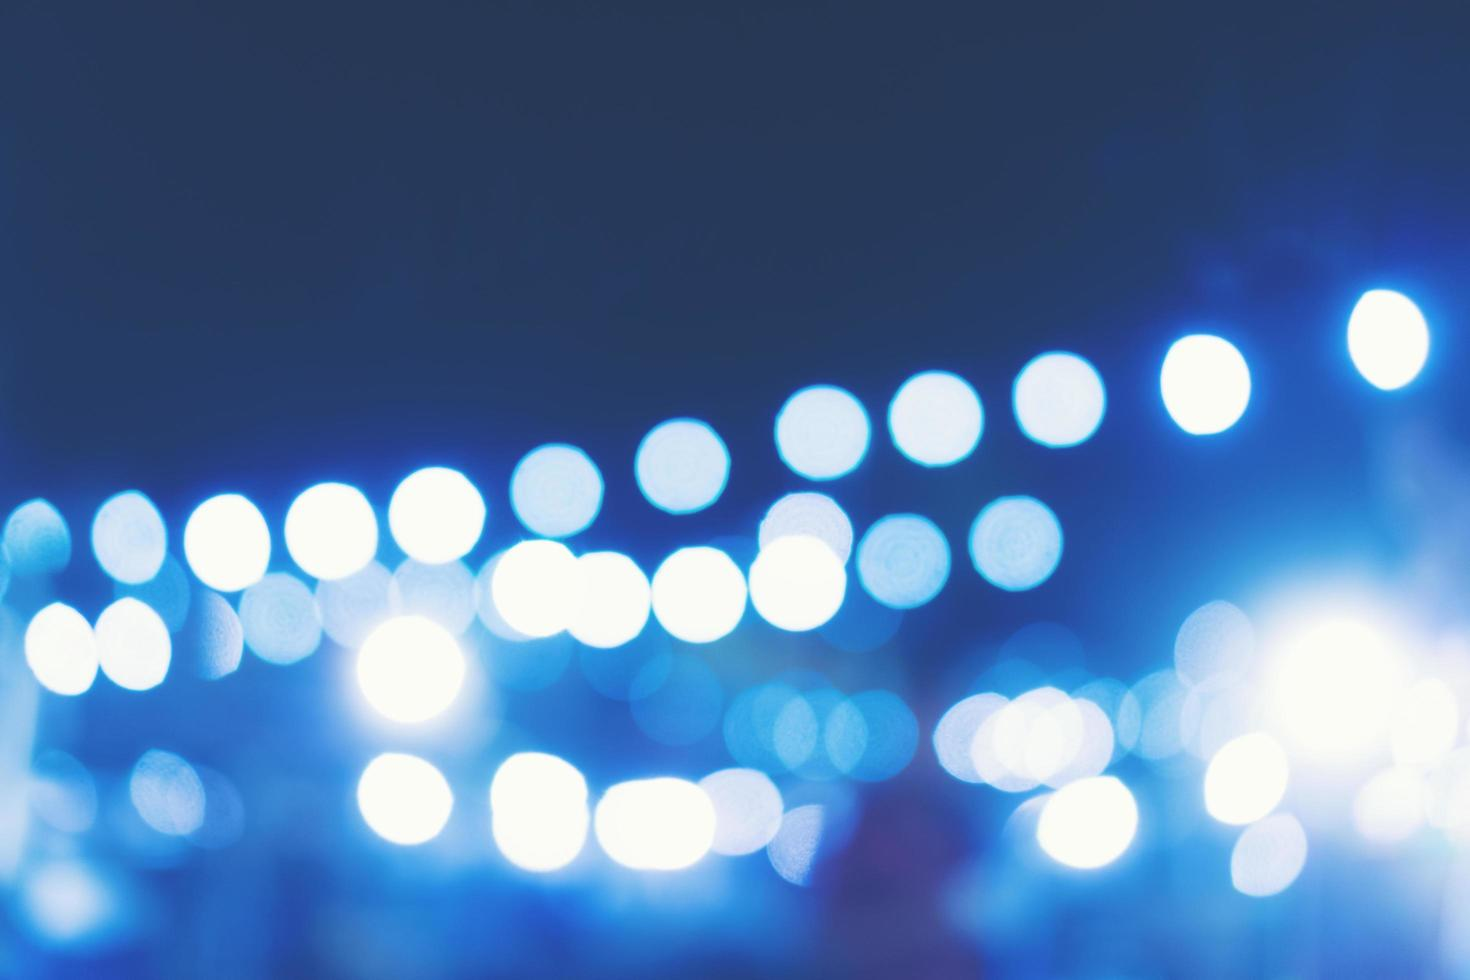 lumières bokeh bleues photo